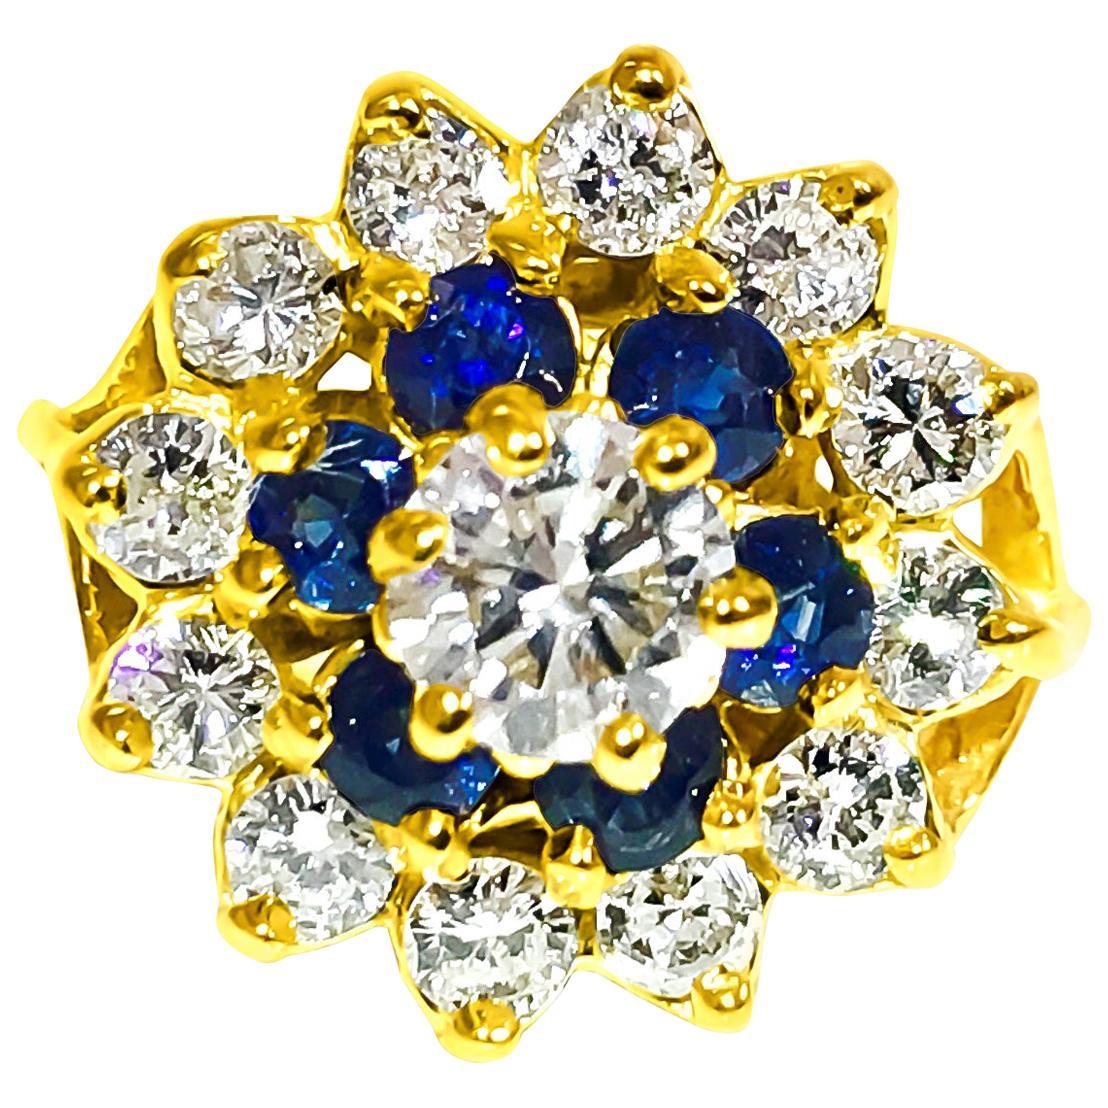 2.12 Carat Blue Sapphire Diamond Cocktail Ring 18 Karat Yellow Gold